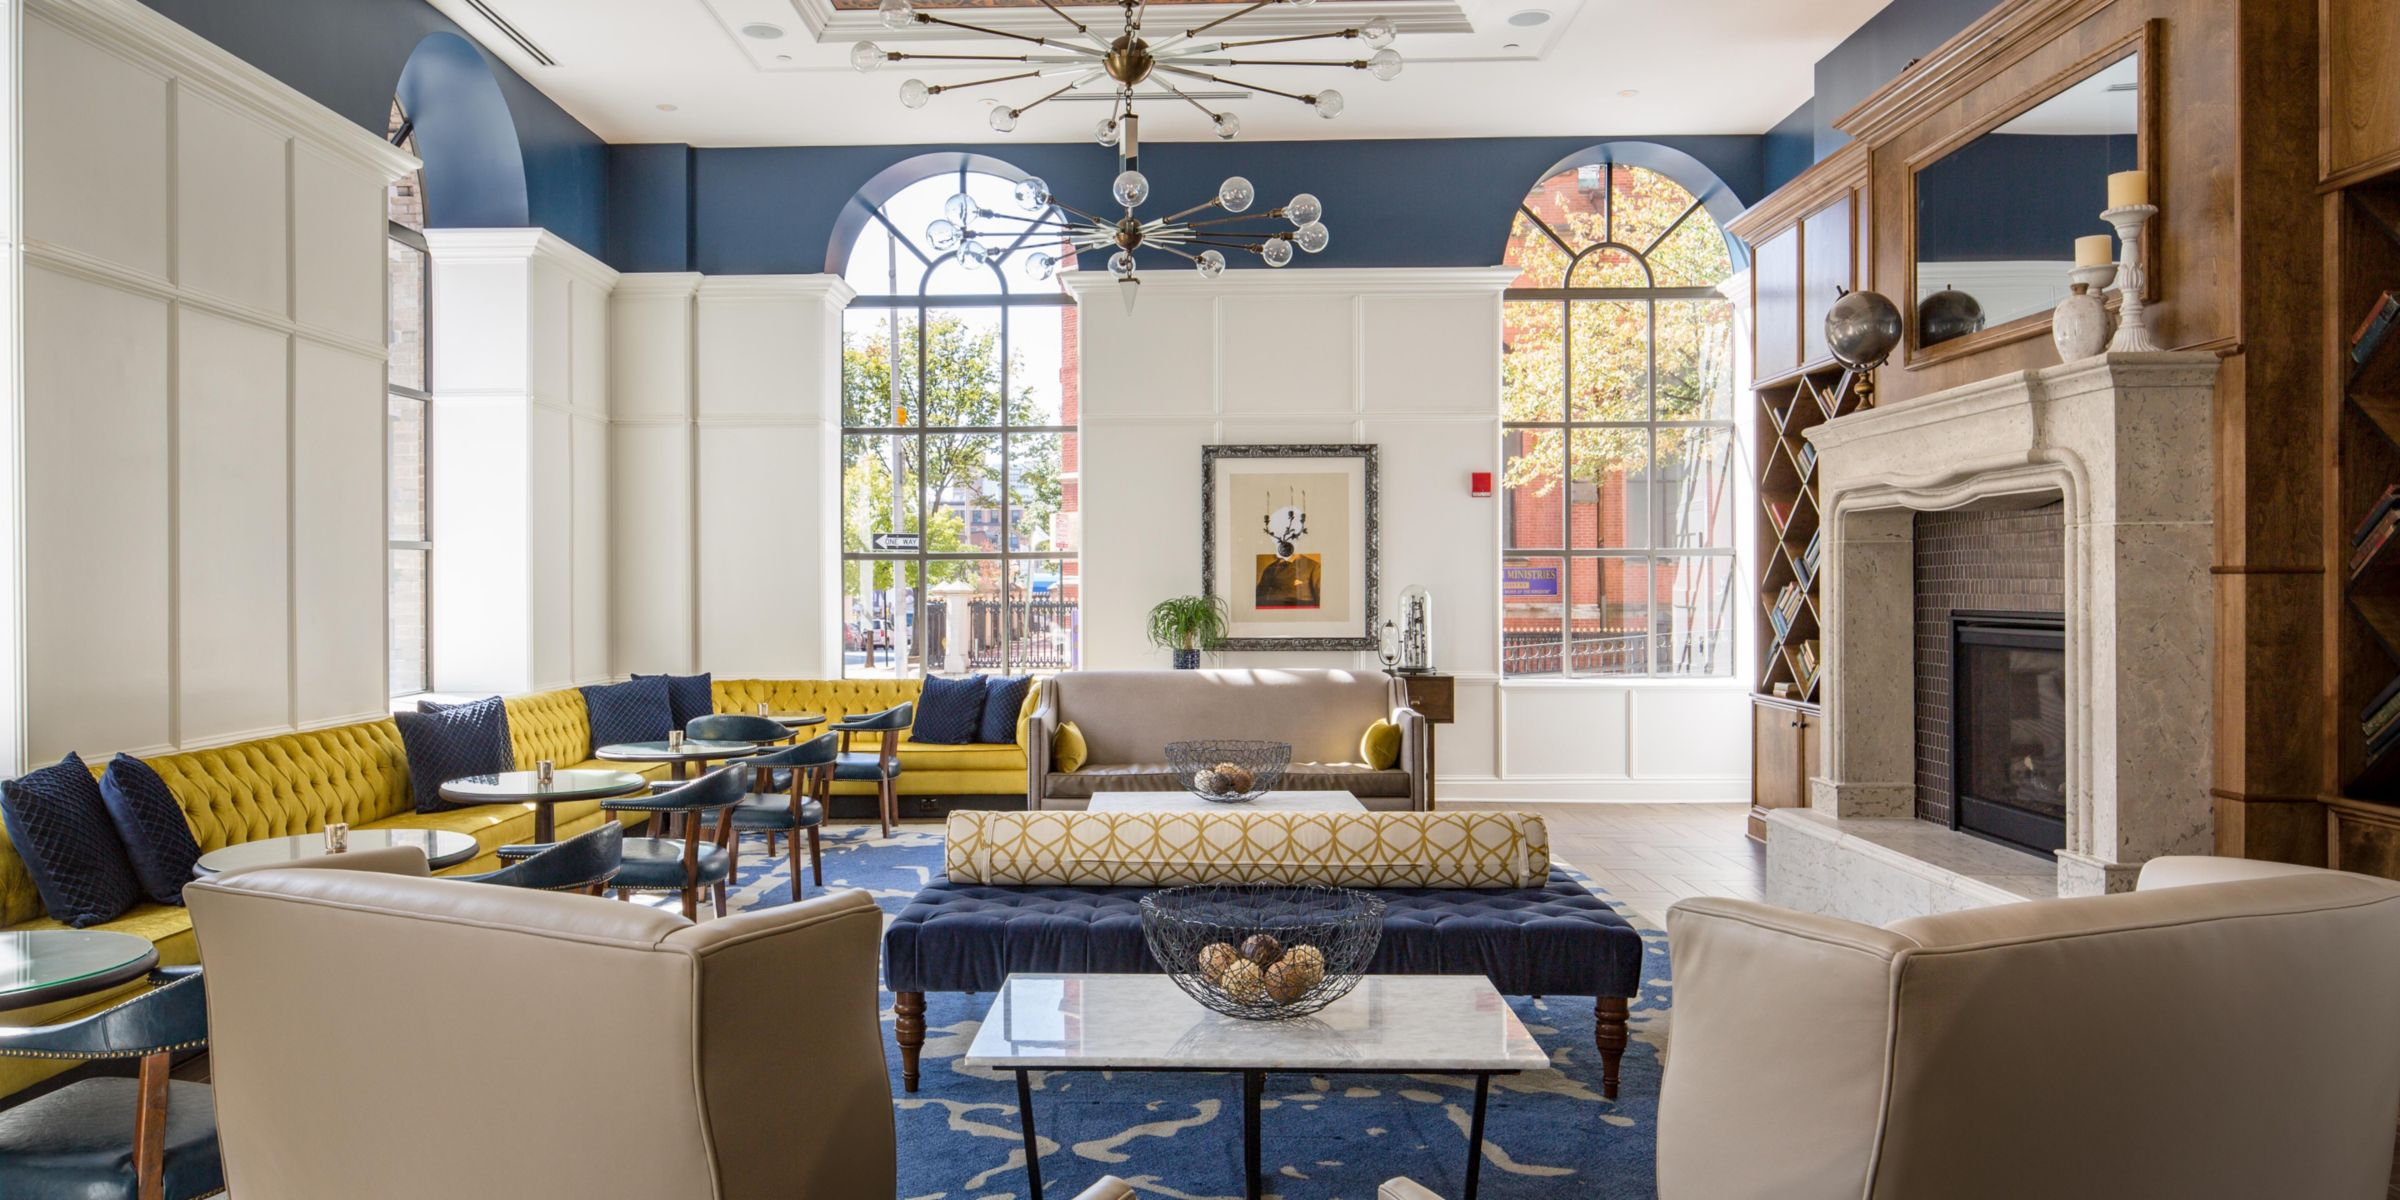 Hotel Indigo Anaheim - Hotel Meeting Rooms for Rent